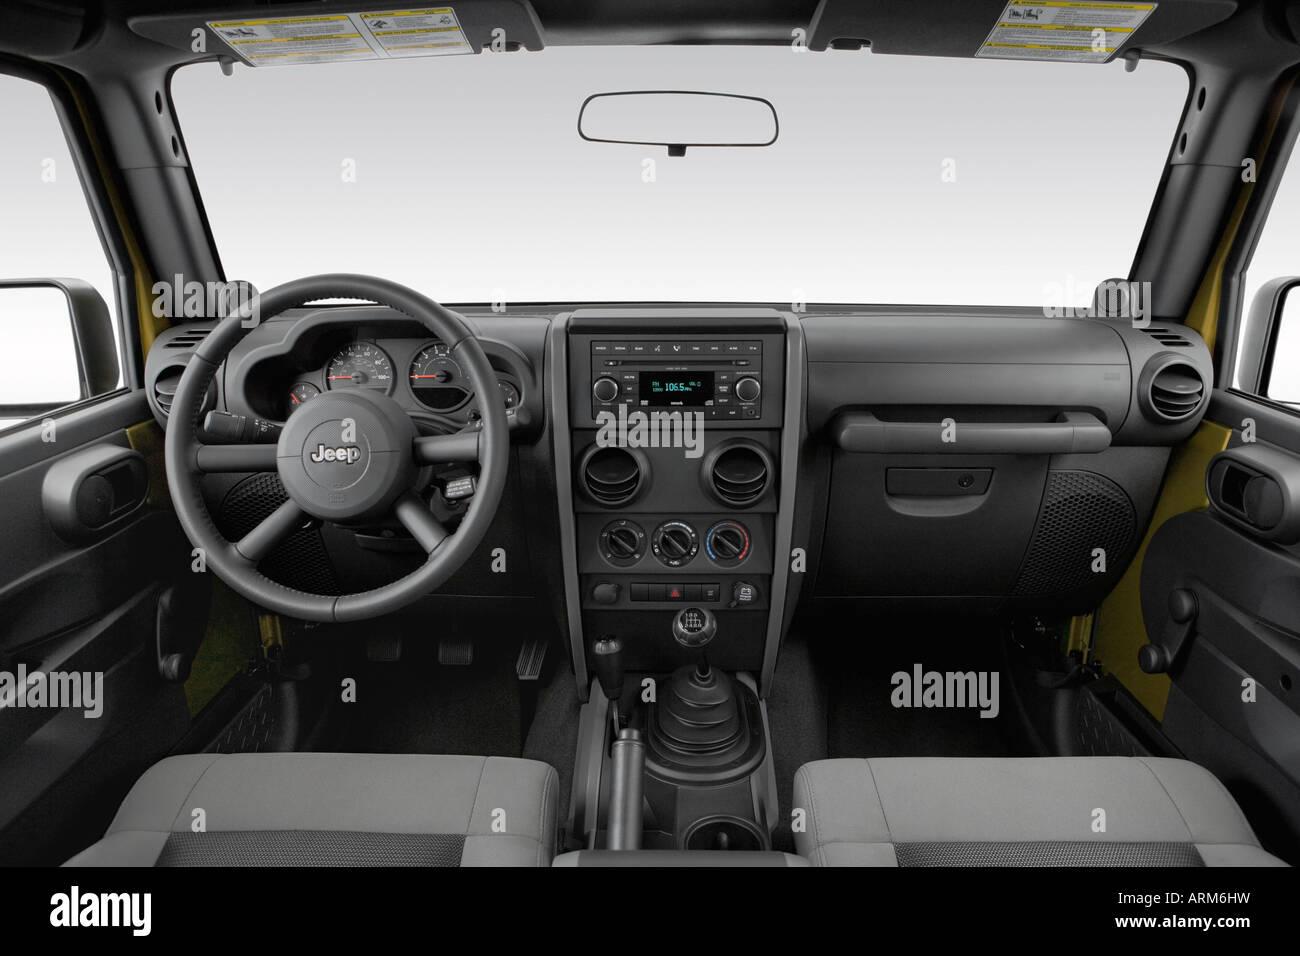 2008 Jeep Wrangler Unlimited X Em Verde   Painel De Bordo, Consola Central,  Vista De Mudança De Marchas